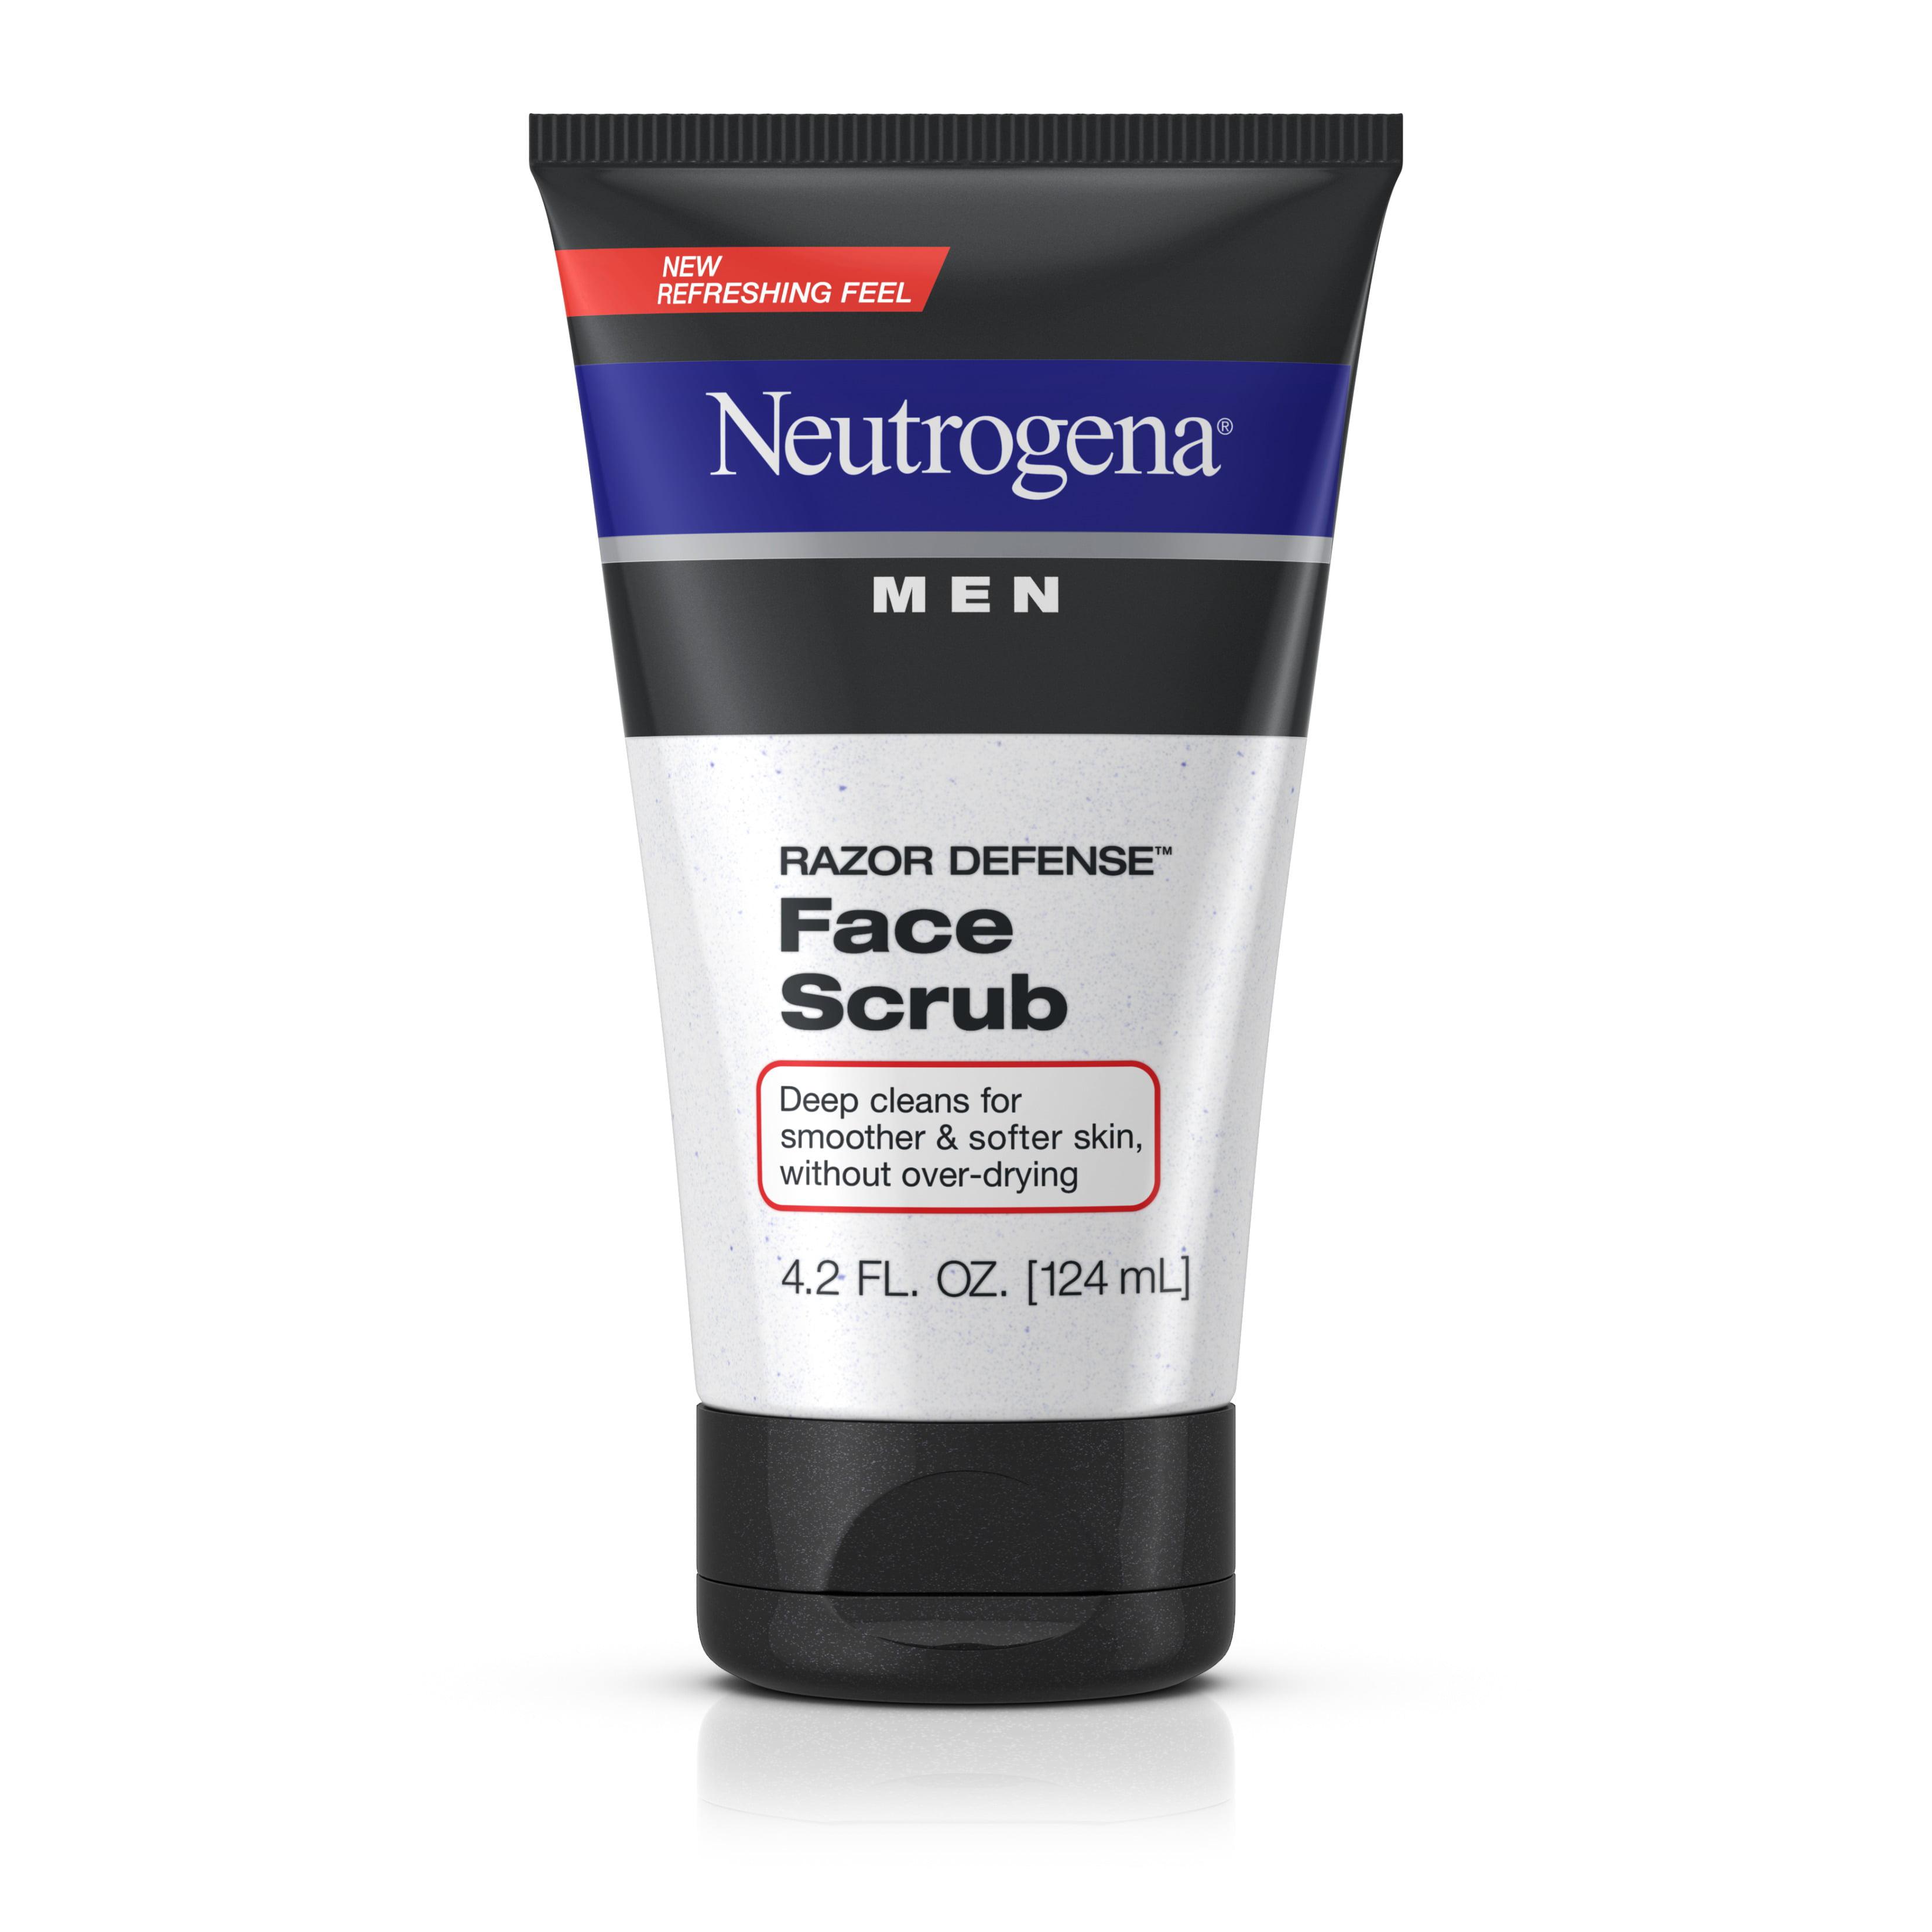 Neutrogena Men Razor Defense Exfoliating Shave Face Scrub, 4.2 fl. oz